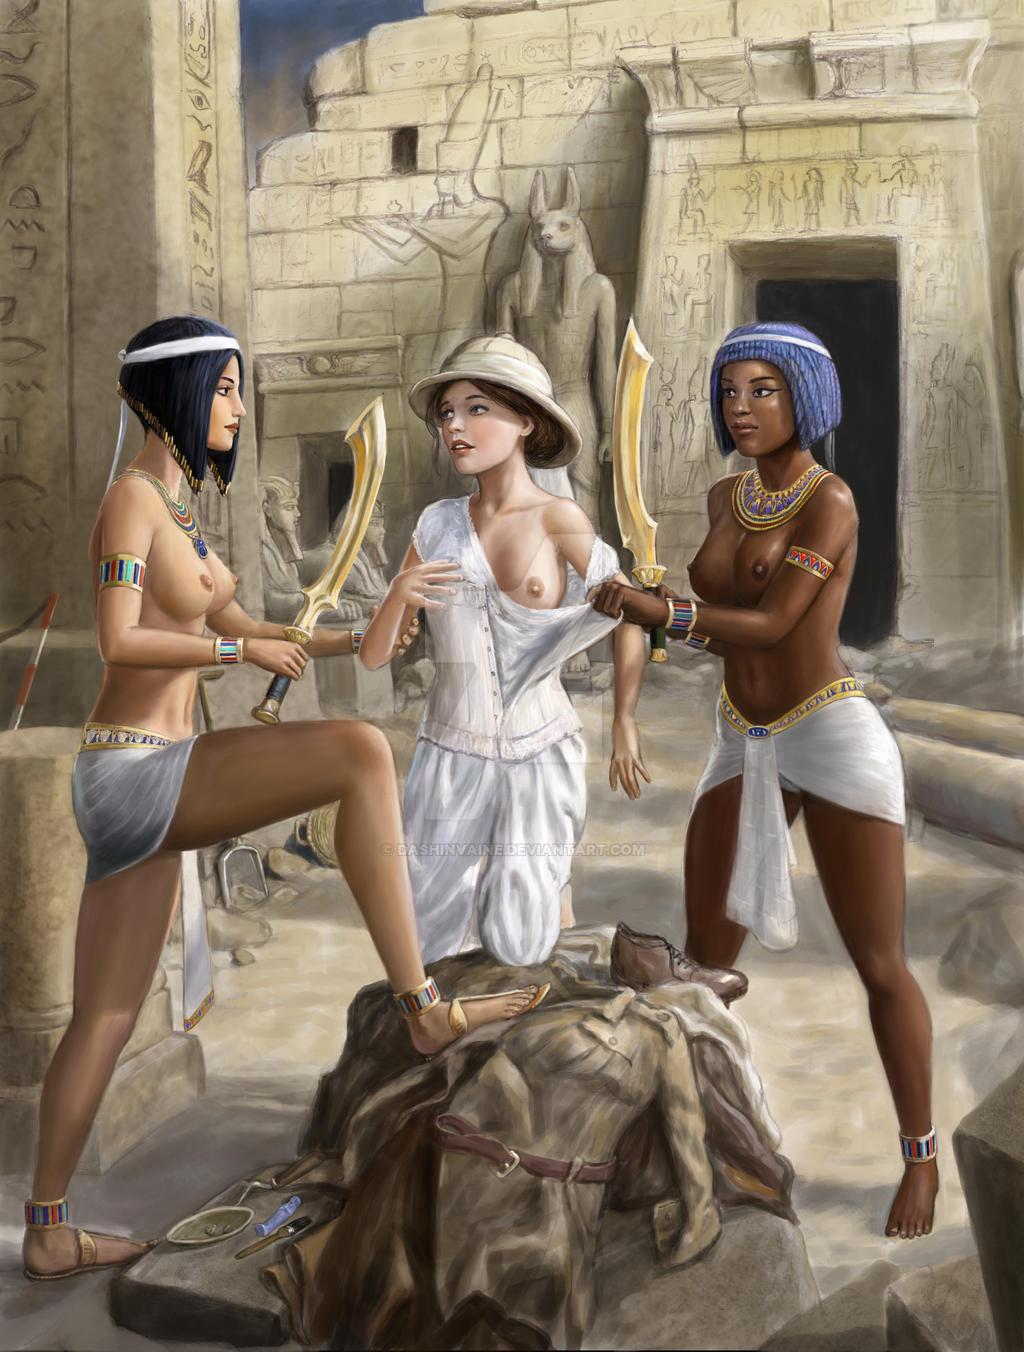 http://img12.deviantart.net/dc32/i/2016/236/c/5/perils_of_a_victorian_explorer_by_dashinvaine-da52vdn.jpg